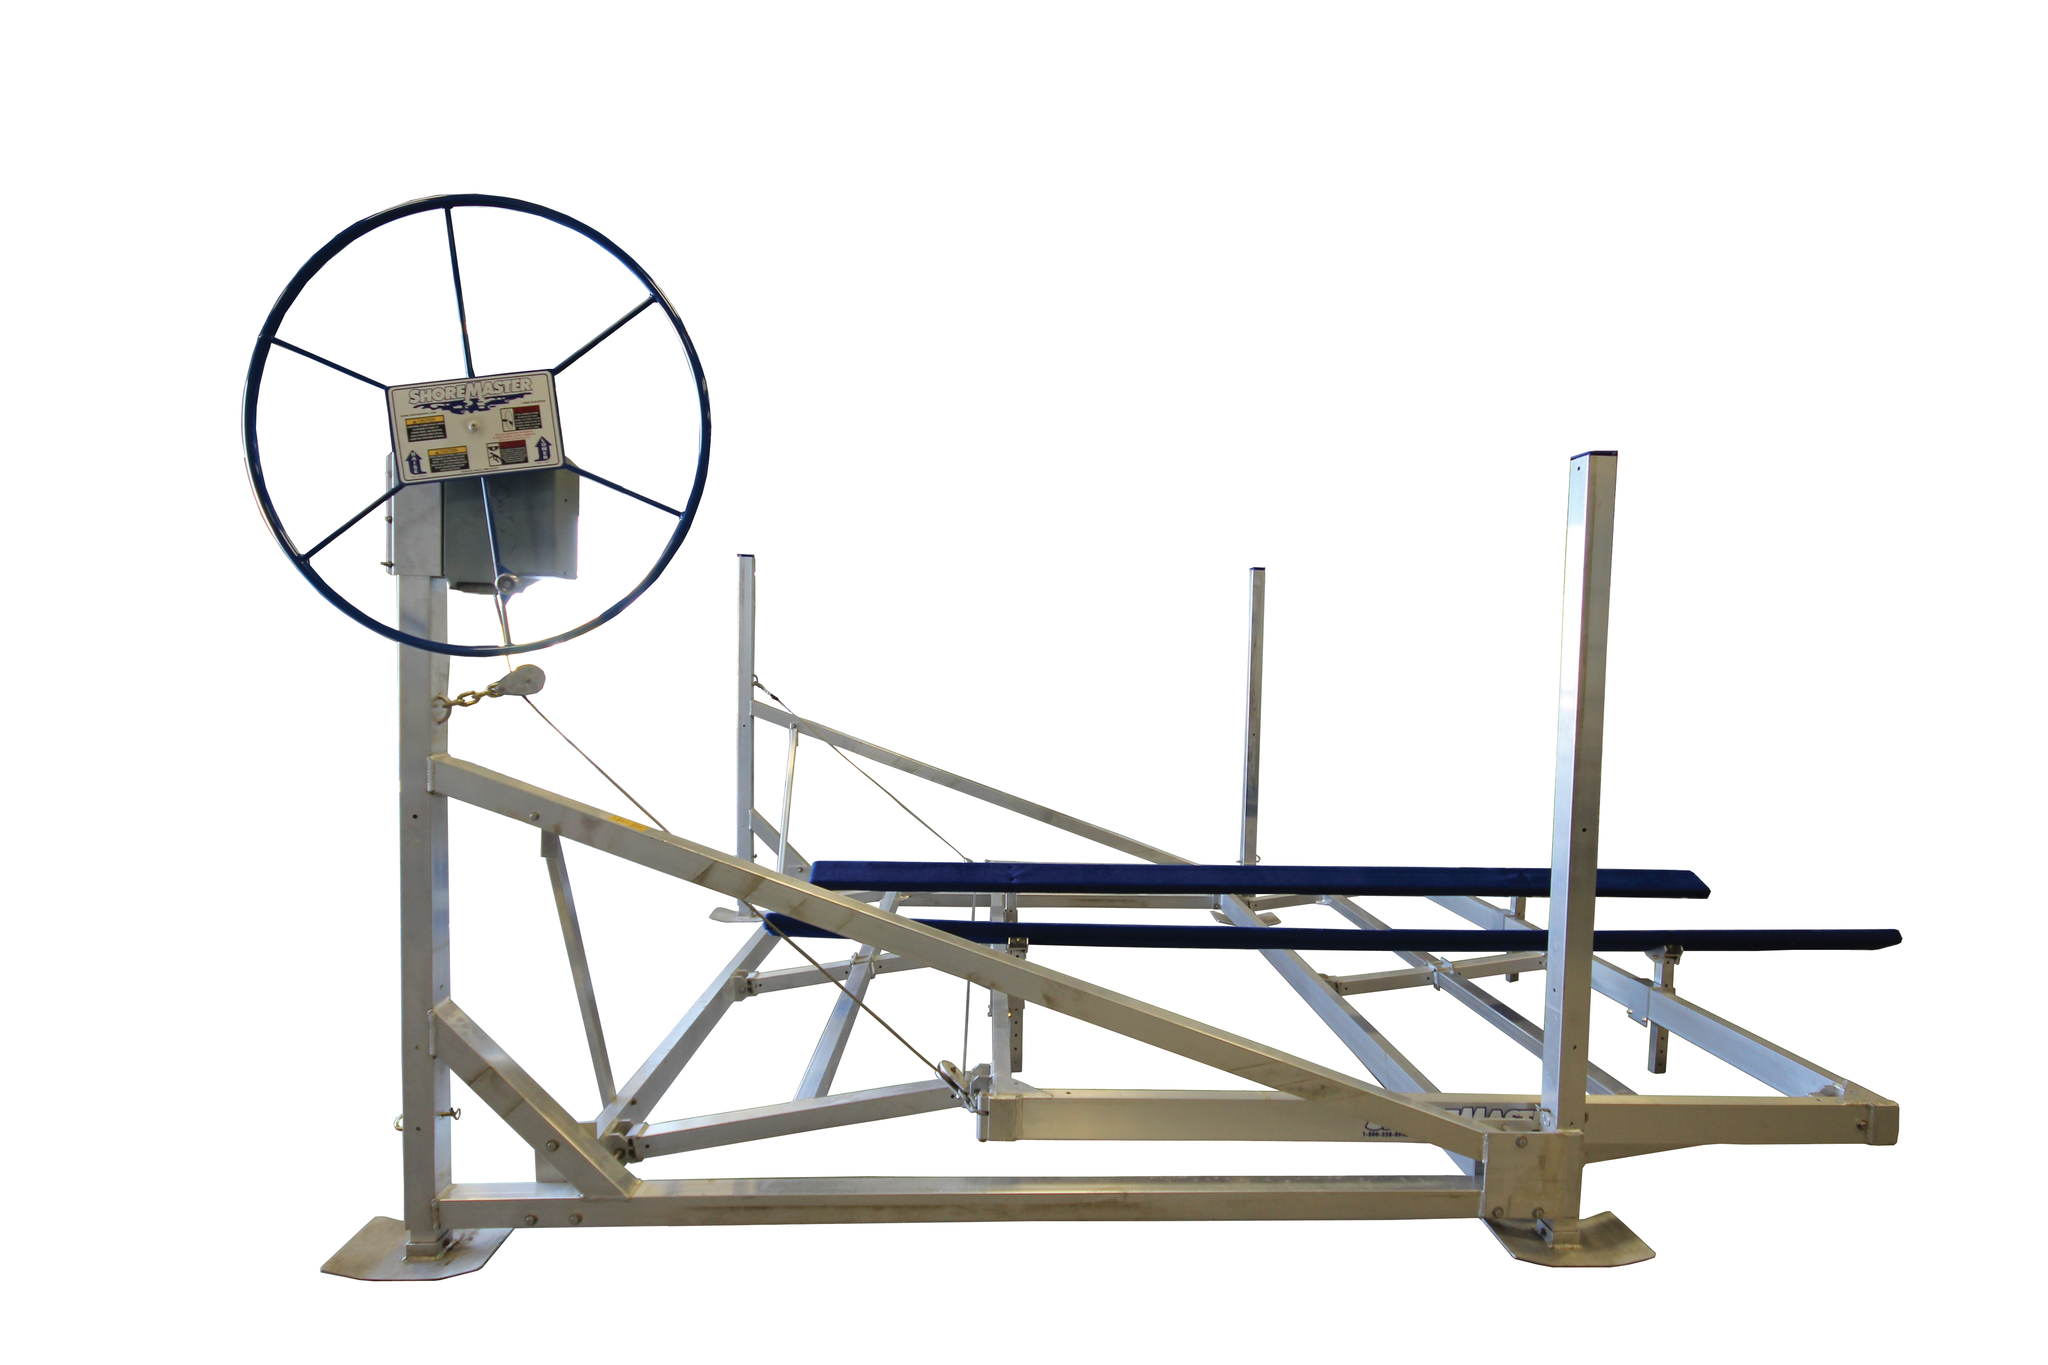 New Shoremaster Universal Boat Lift Wheel Caddy Part 1007018